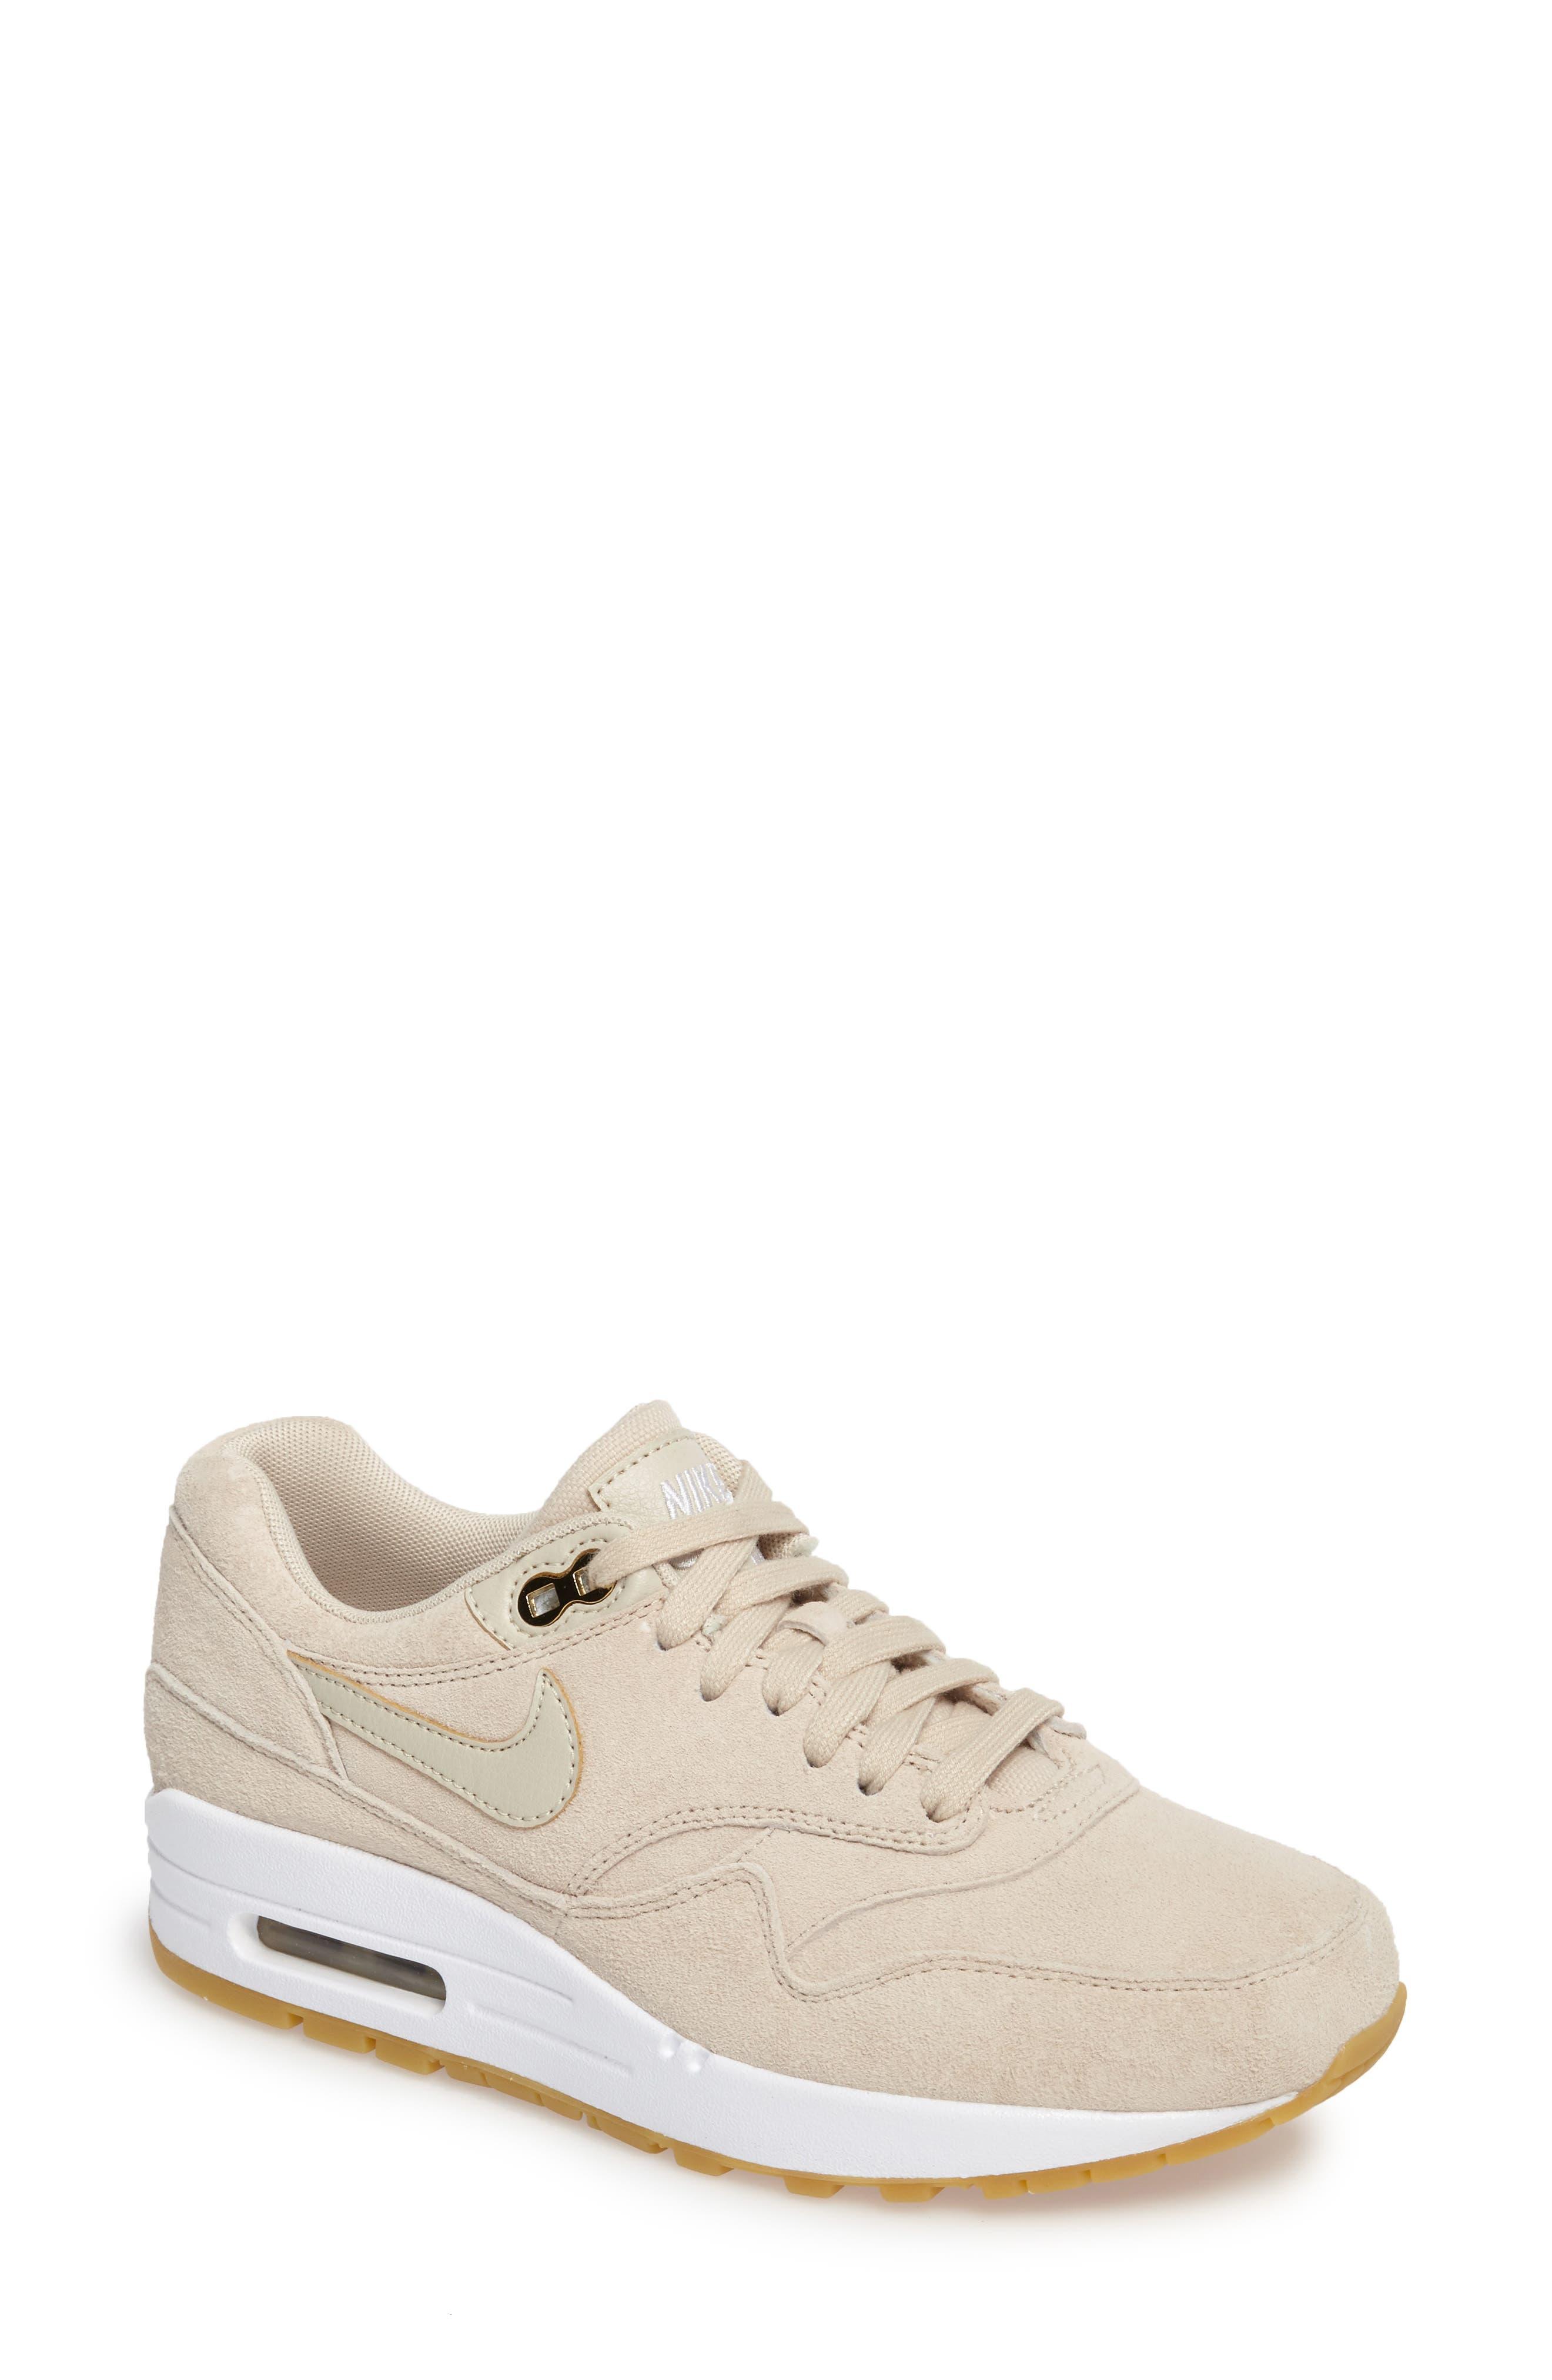 Air Max 1 SD Sneaker,                         Main,                         color, 250